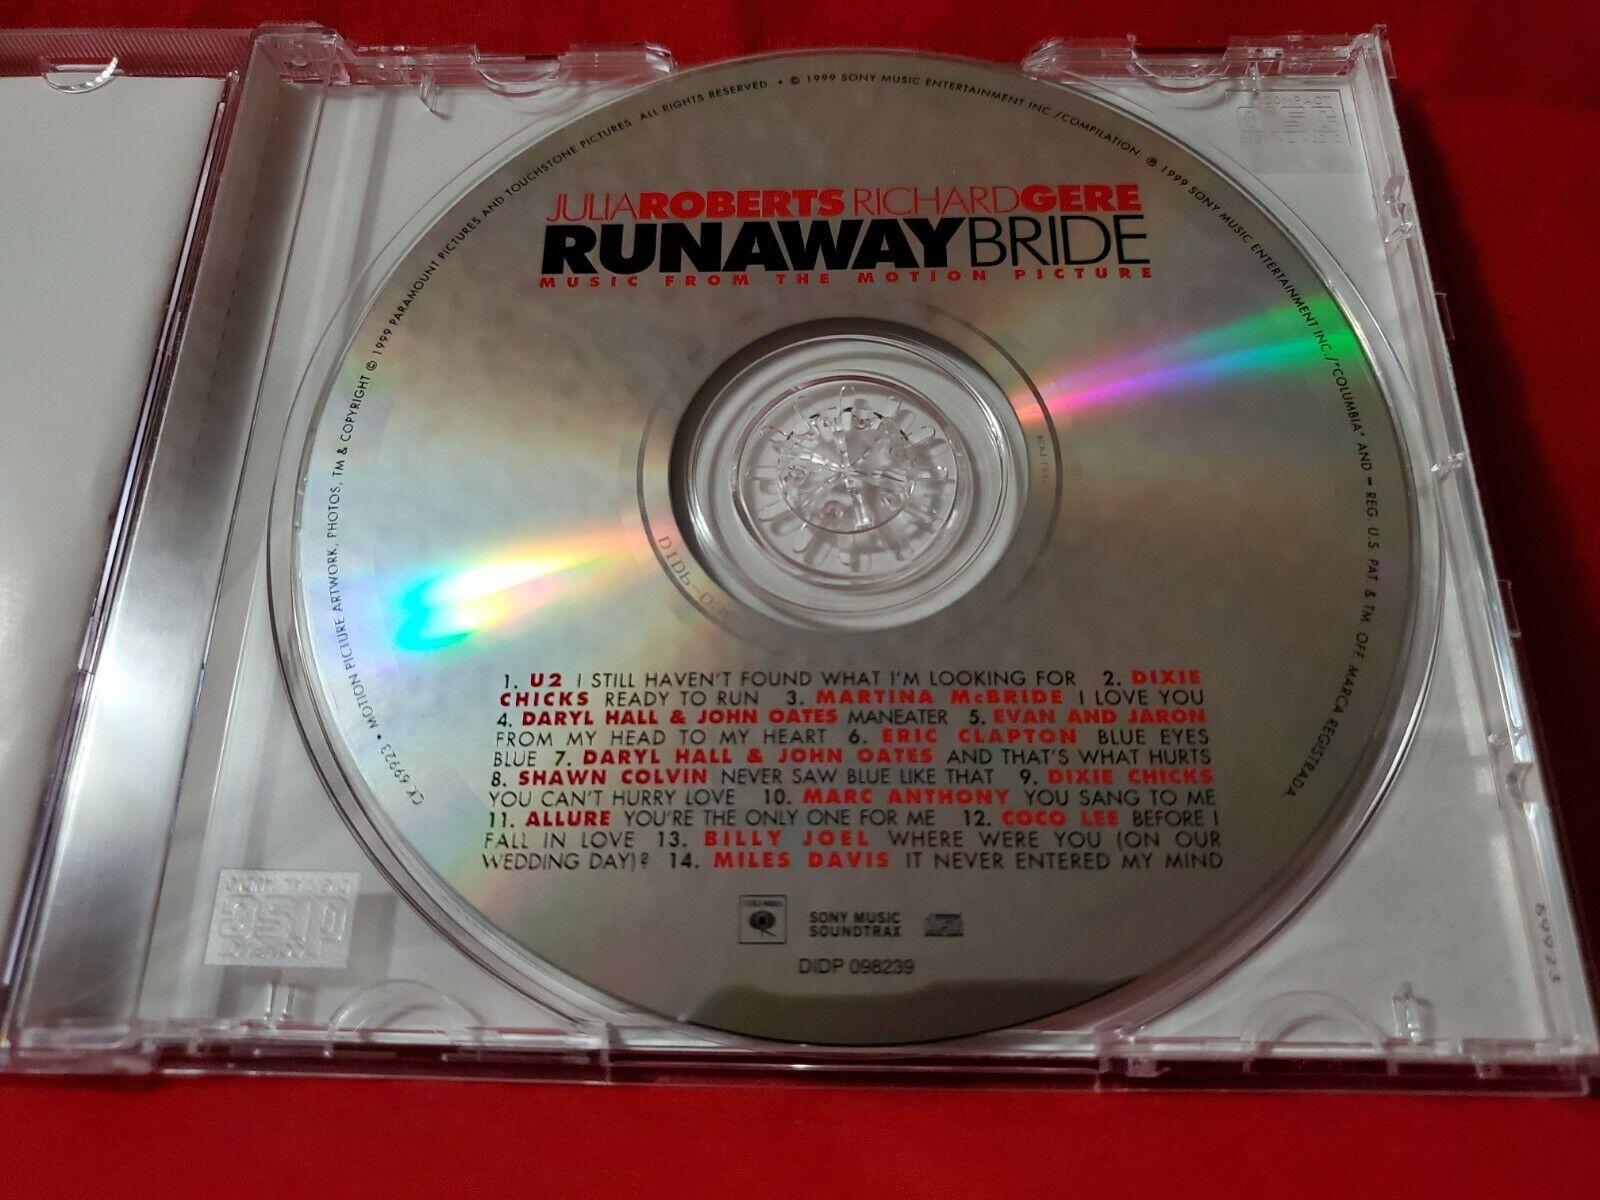 Runaway Bride 1999 Sony Columbia Soundtrack CD Various Artists BMG Release  - $2.98